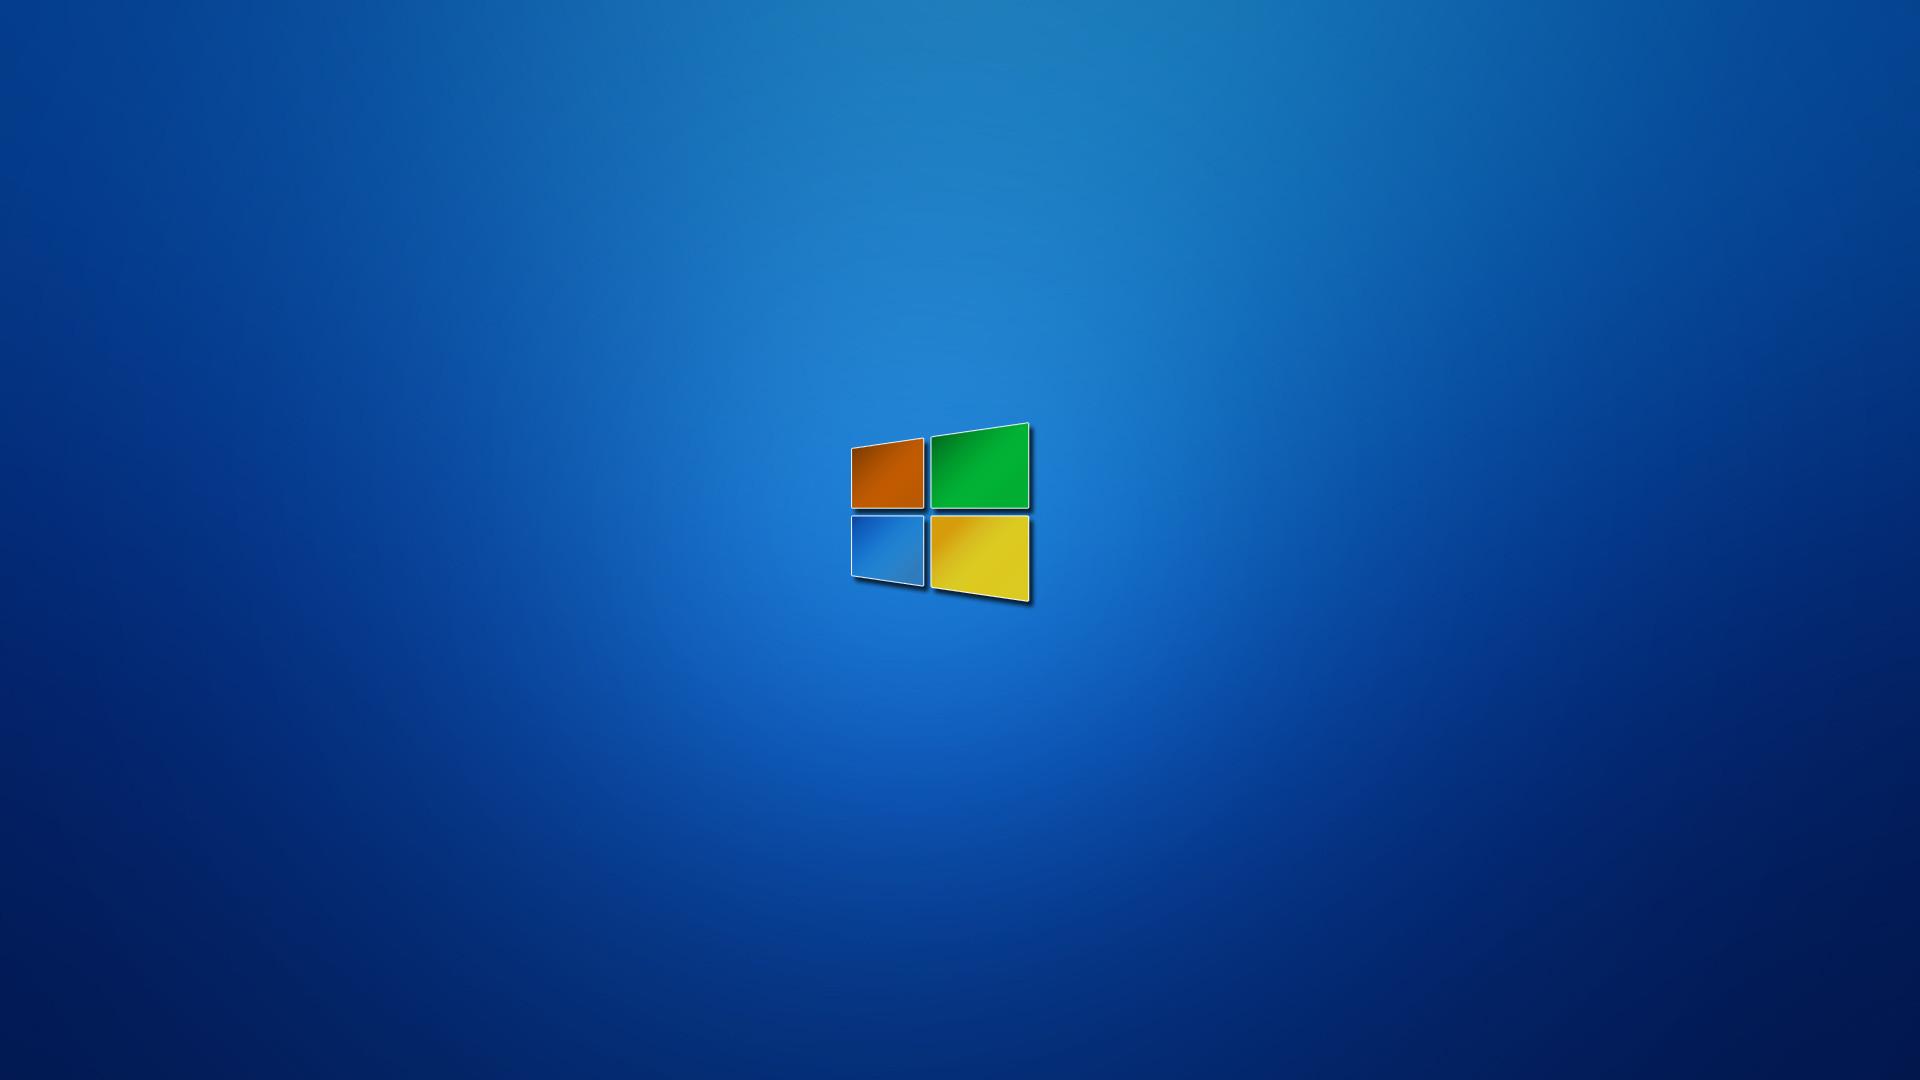 wallpapers for windows 8 desktop (72+ images)